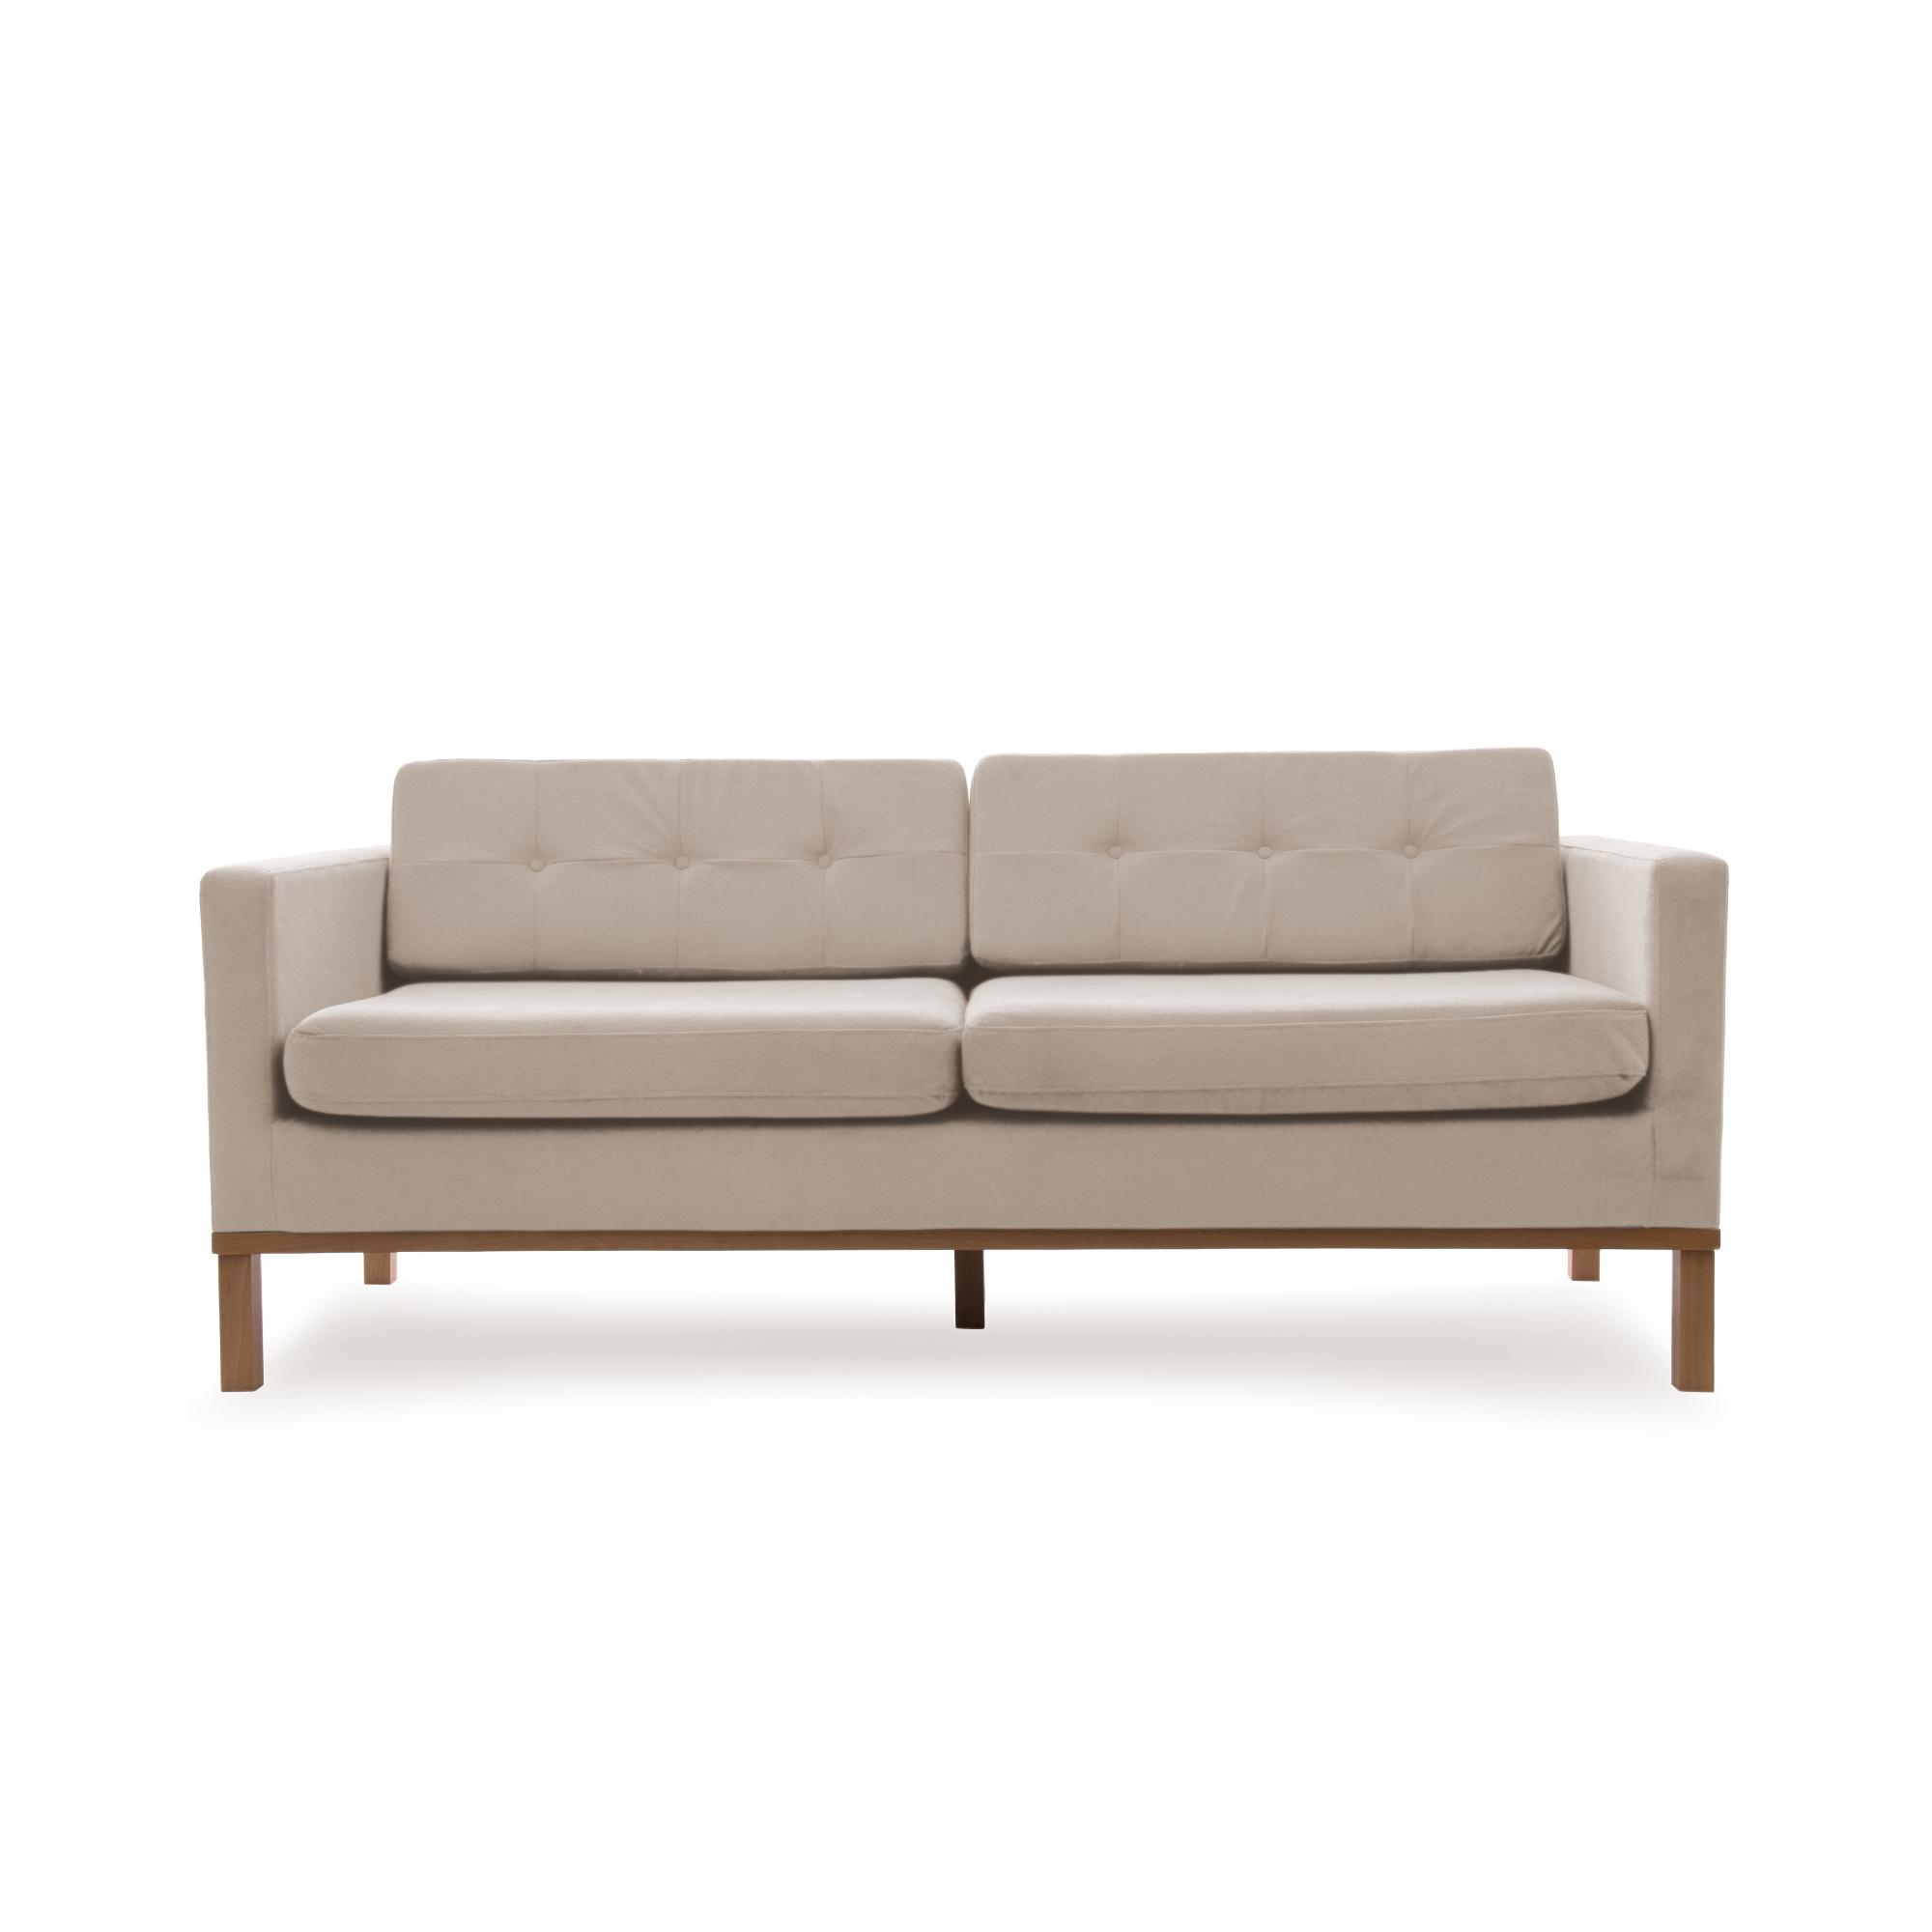 Canapea Fixa 3 locuri Jonan Beige/Natural